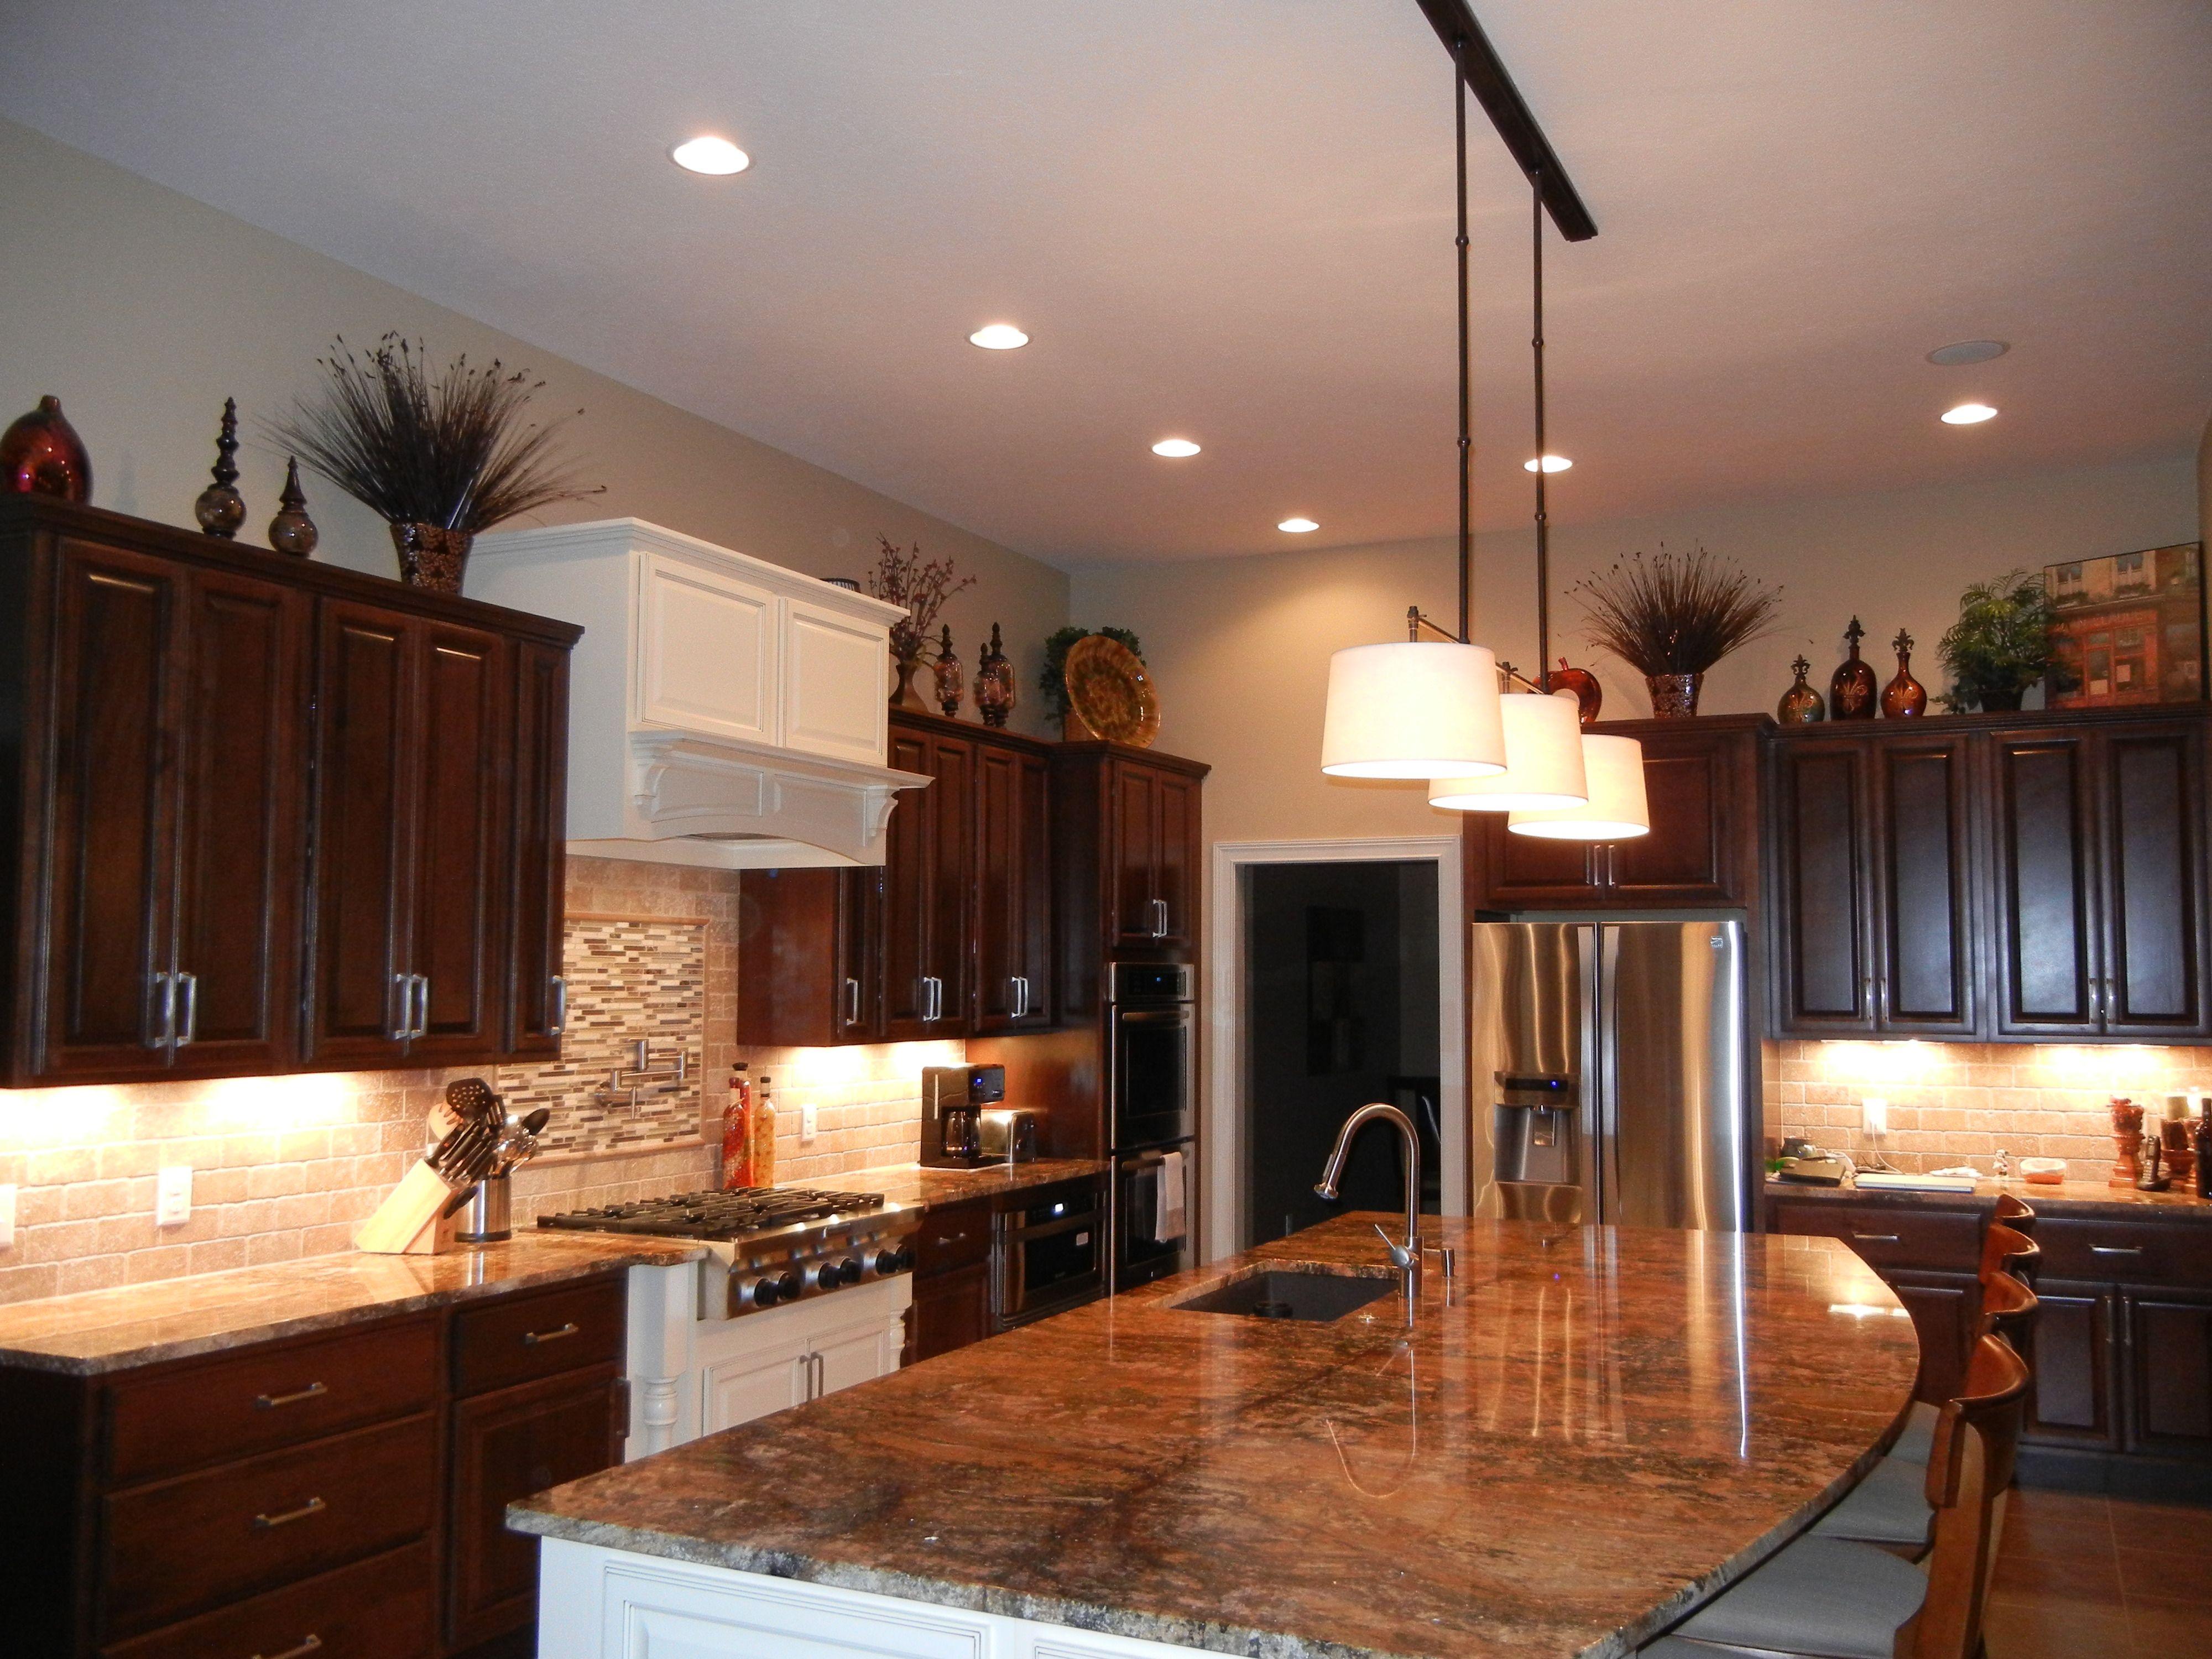 Visual Comfort Light Fixture. Mascarella Granite. HAAS Cabinetry. Kitchen Aide Appliances.